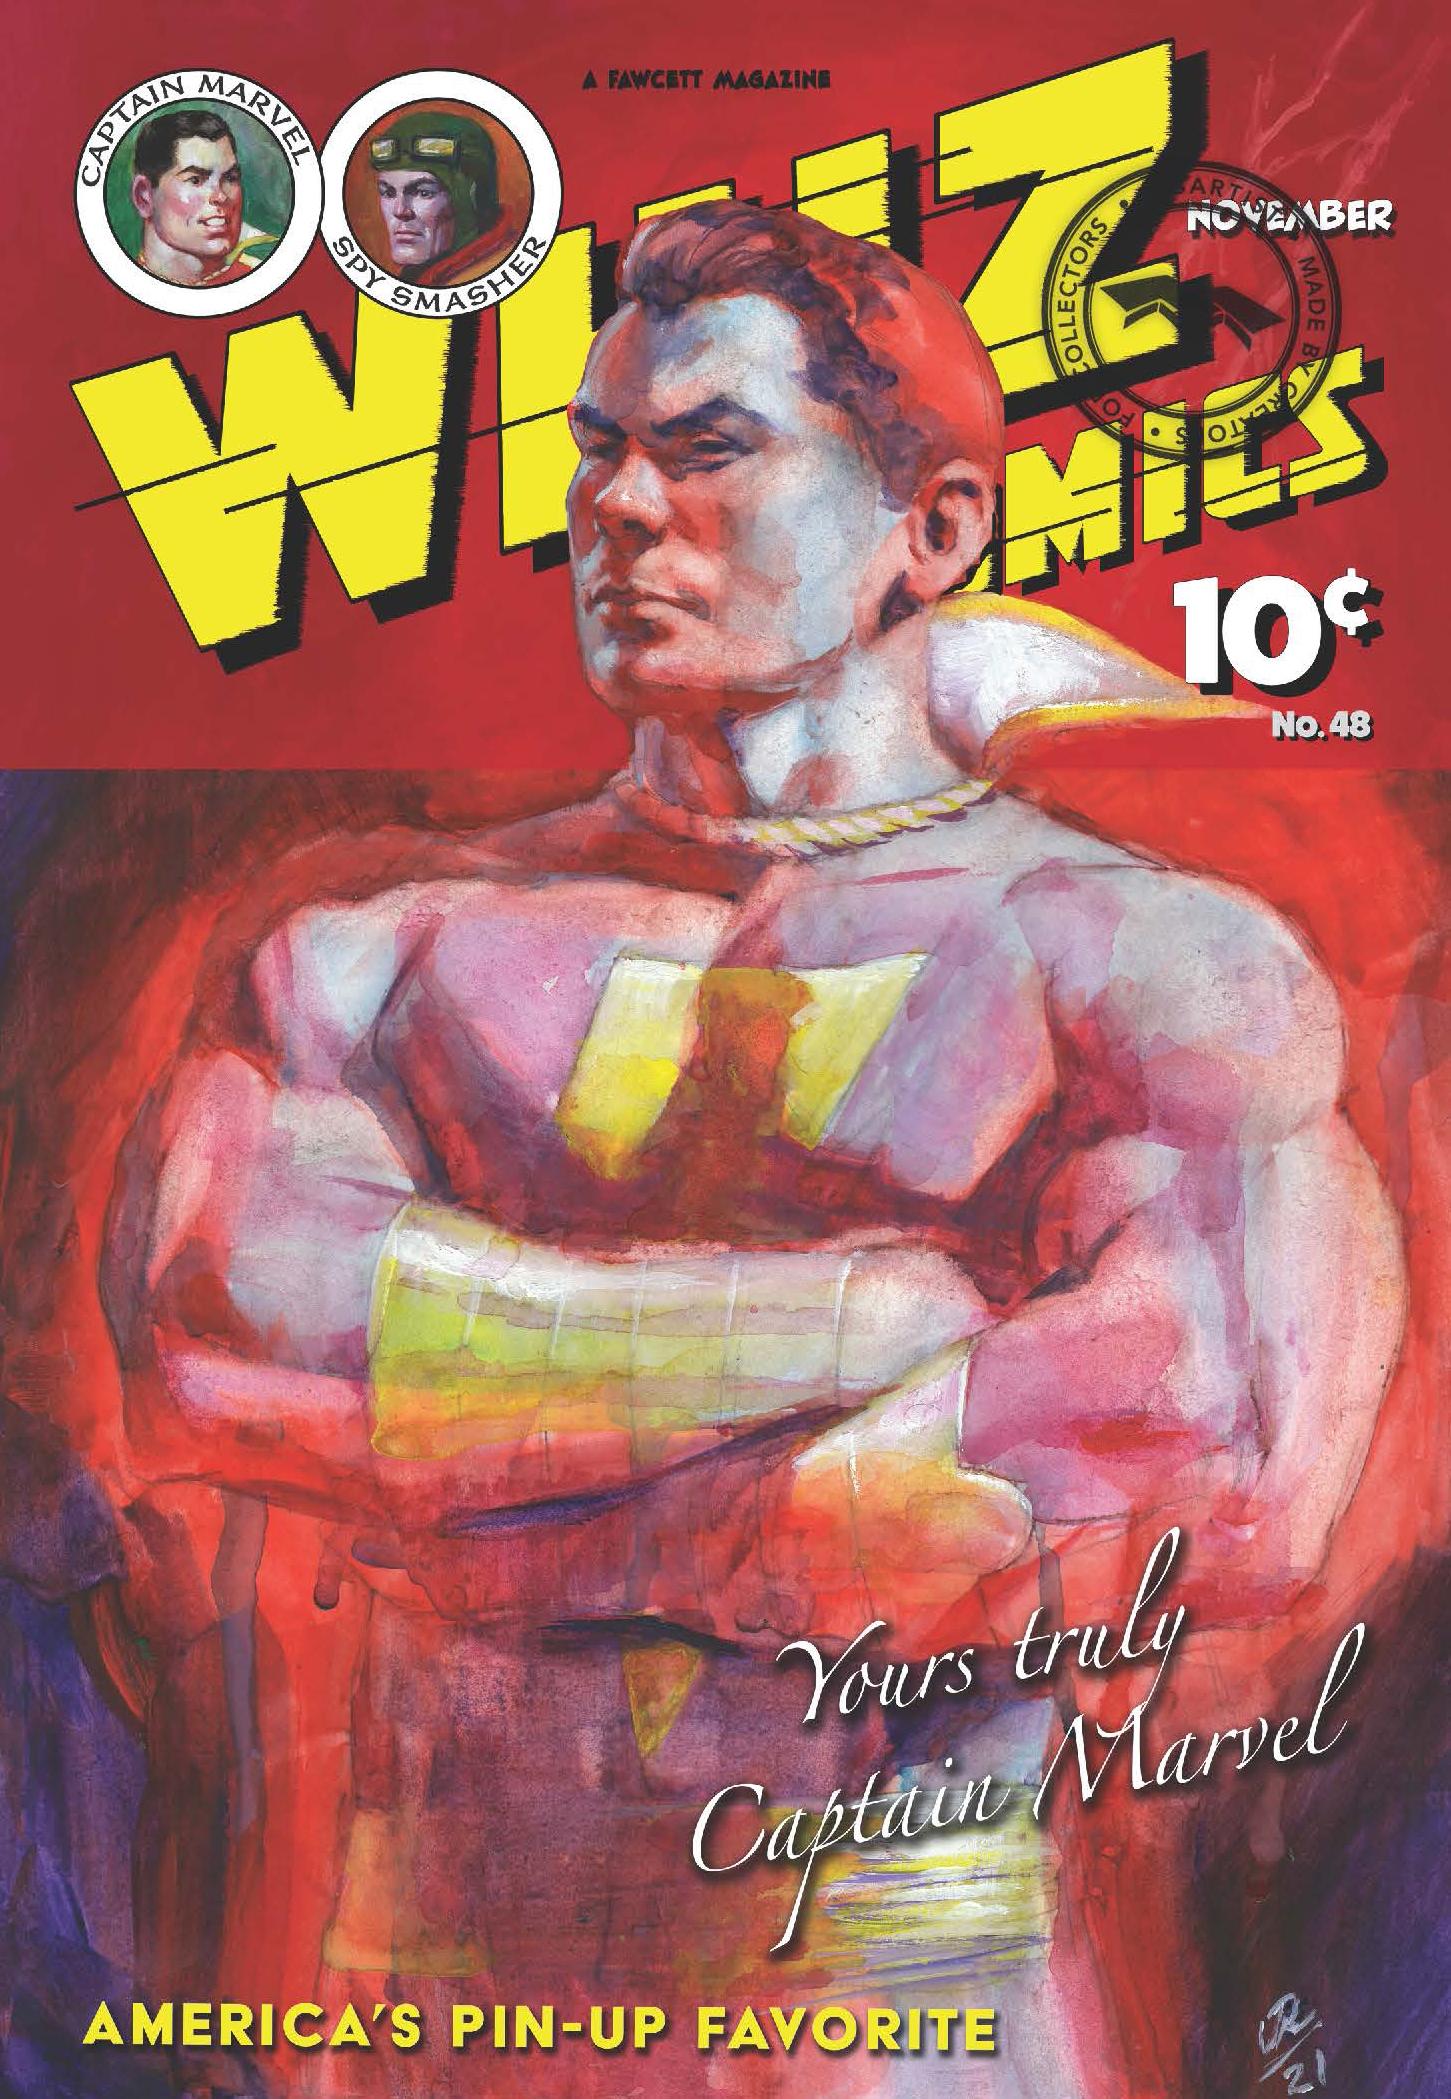 WHIZ COMICS #48: COVER RECREATION, FACSIMILE REPRINT